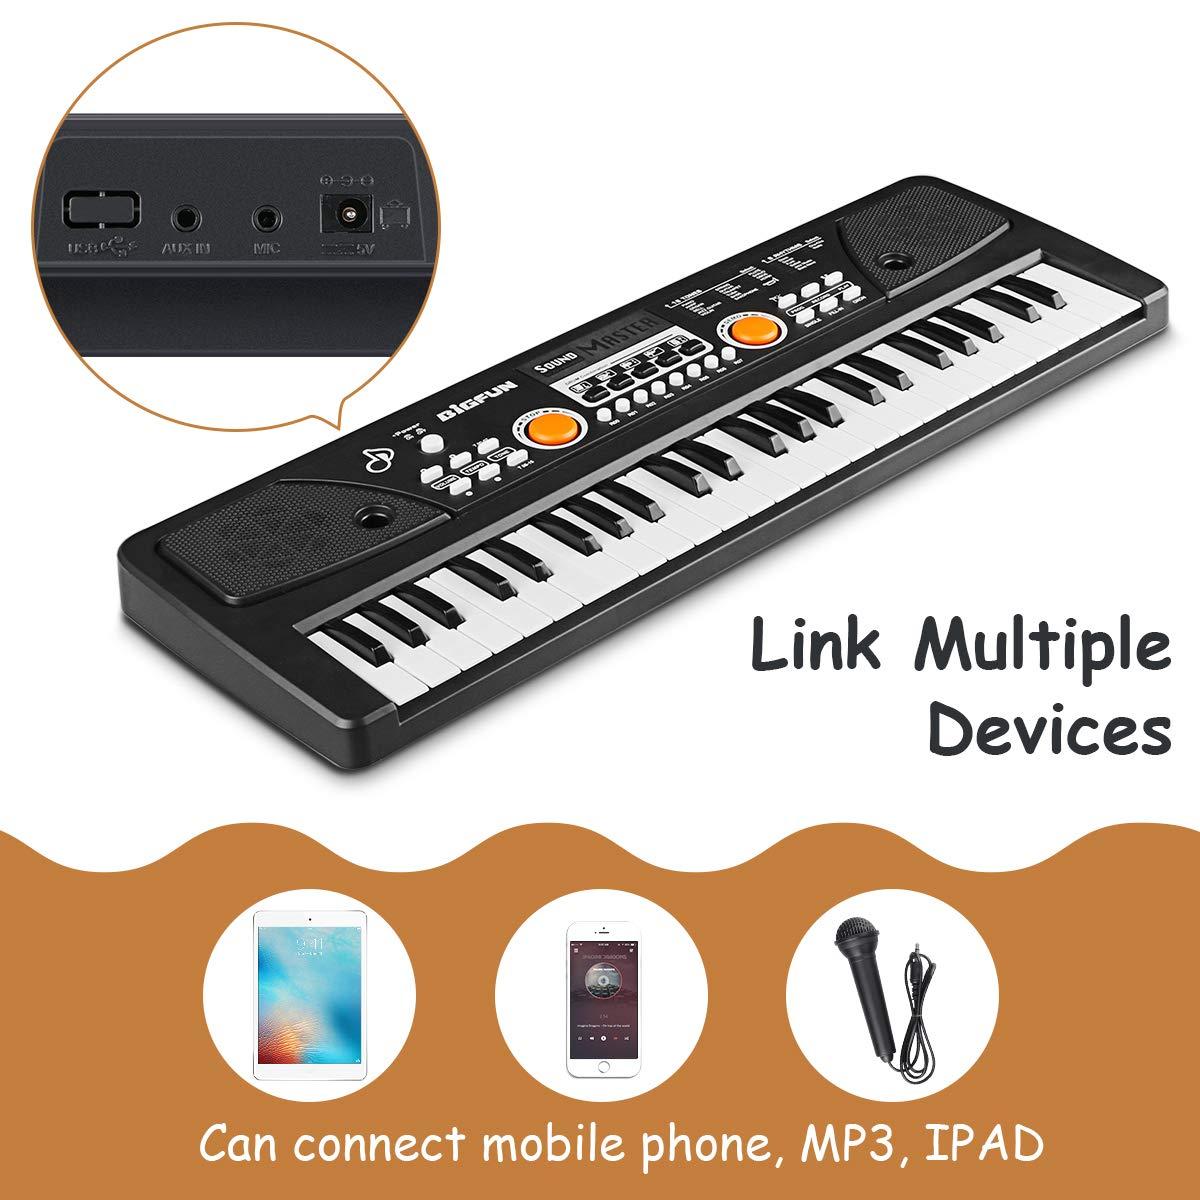 RenFox 49 Key Piano Keyboard Portable Electronic Kids Piano Keyboard Beginner Digital Music Piano Keyboard & Microphone Teaching Toy Gift for Kids Boy Girl by RenFox (Image #4)